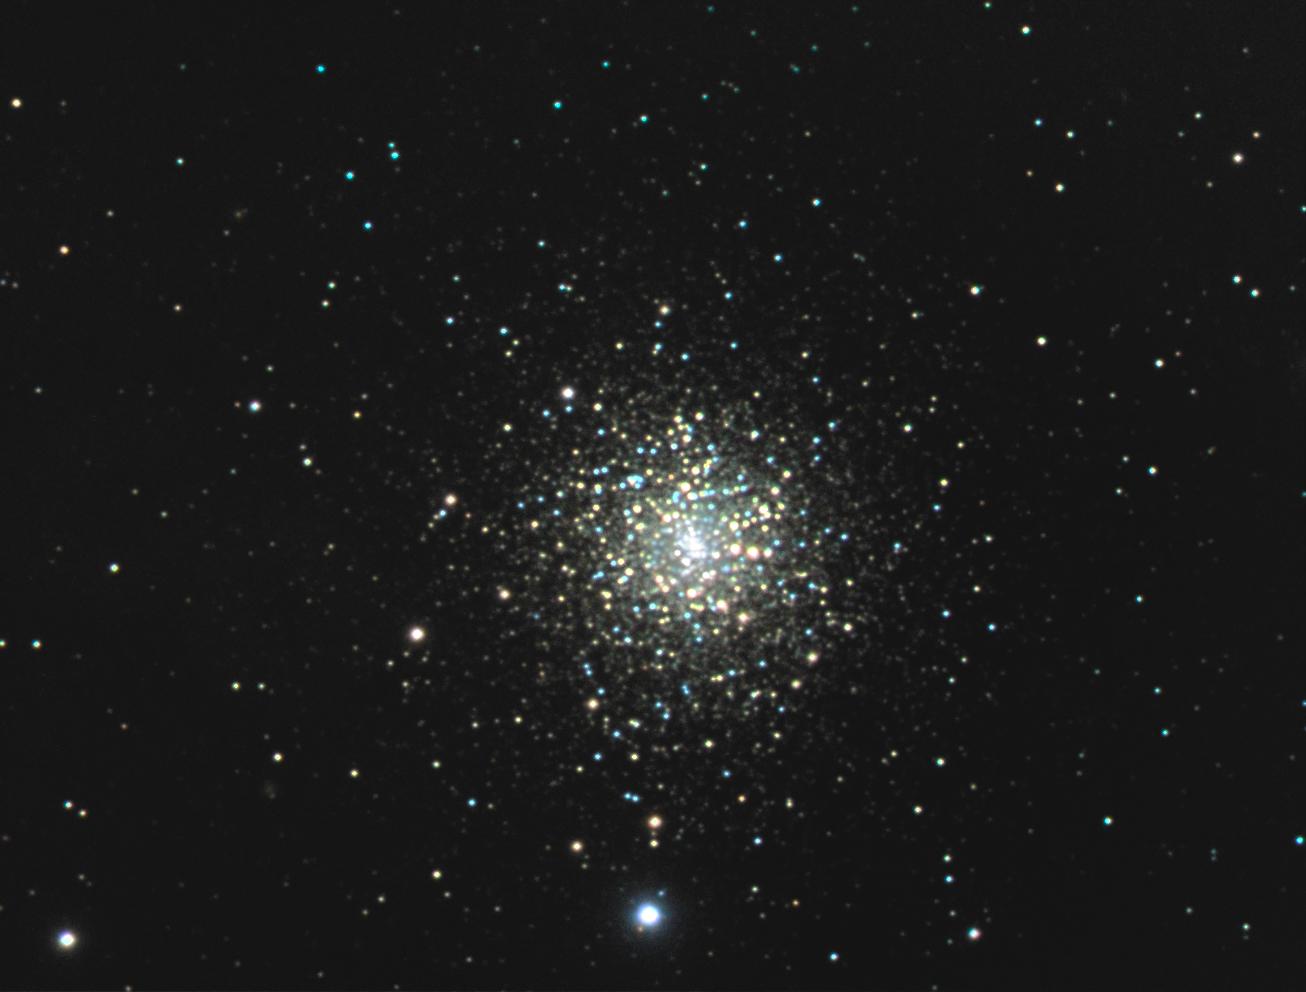 M30-C8-red0.63antares-atik16hr-LRVB-v2.j